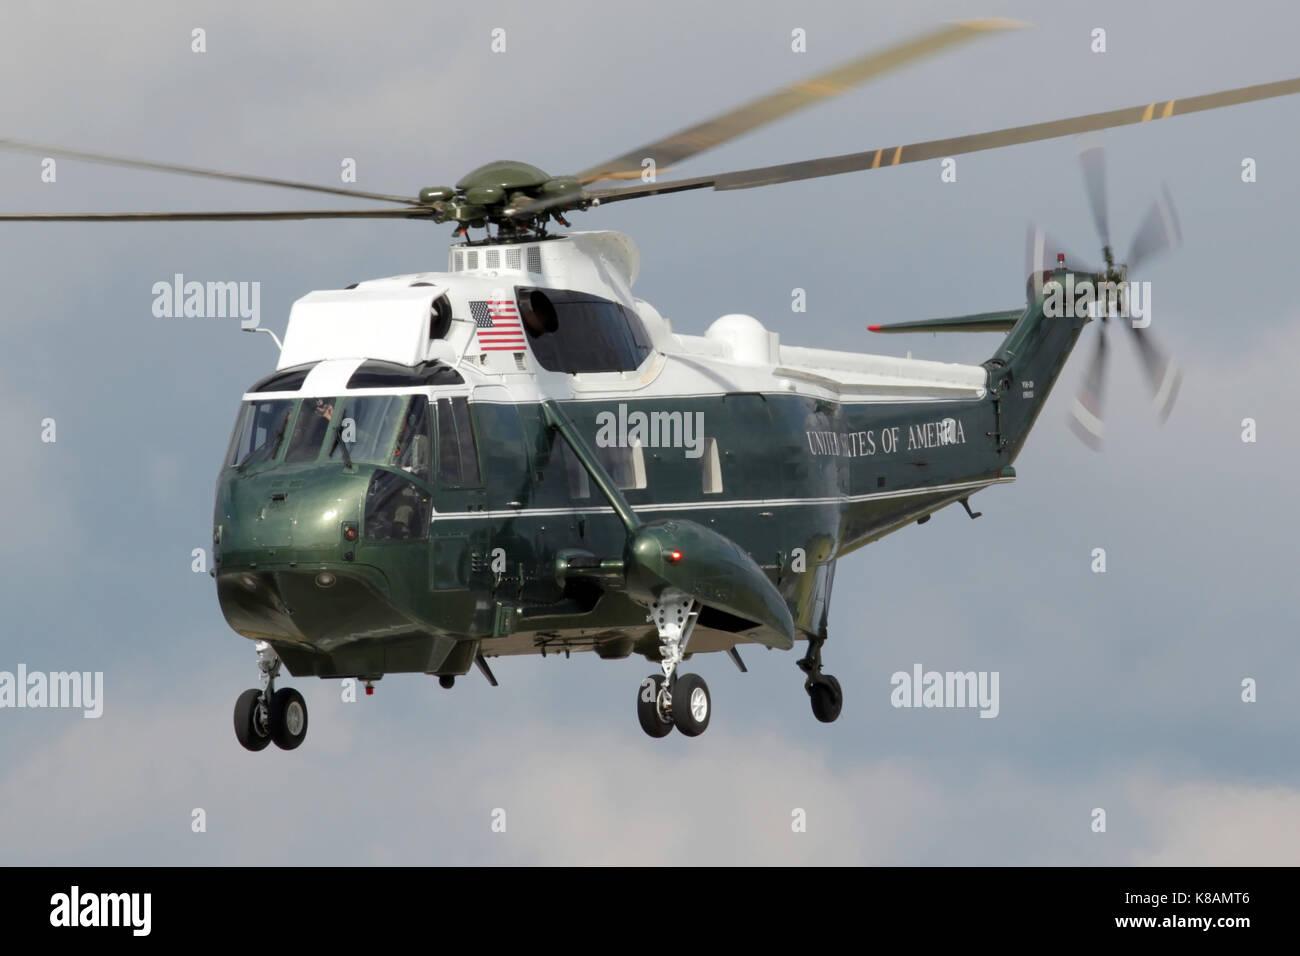 usmc-vh-3d-call-sign-nighthawk-1marine-1